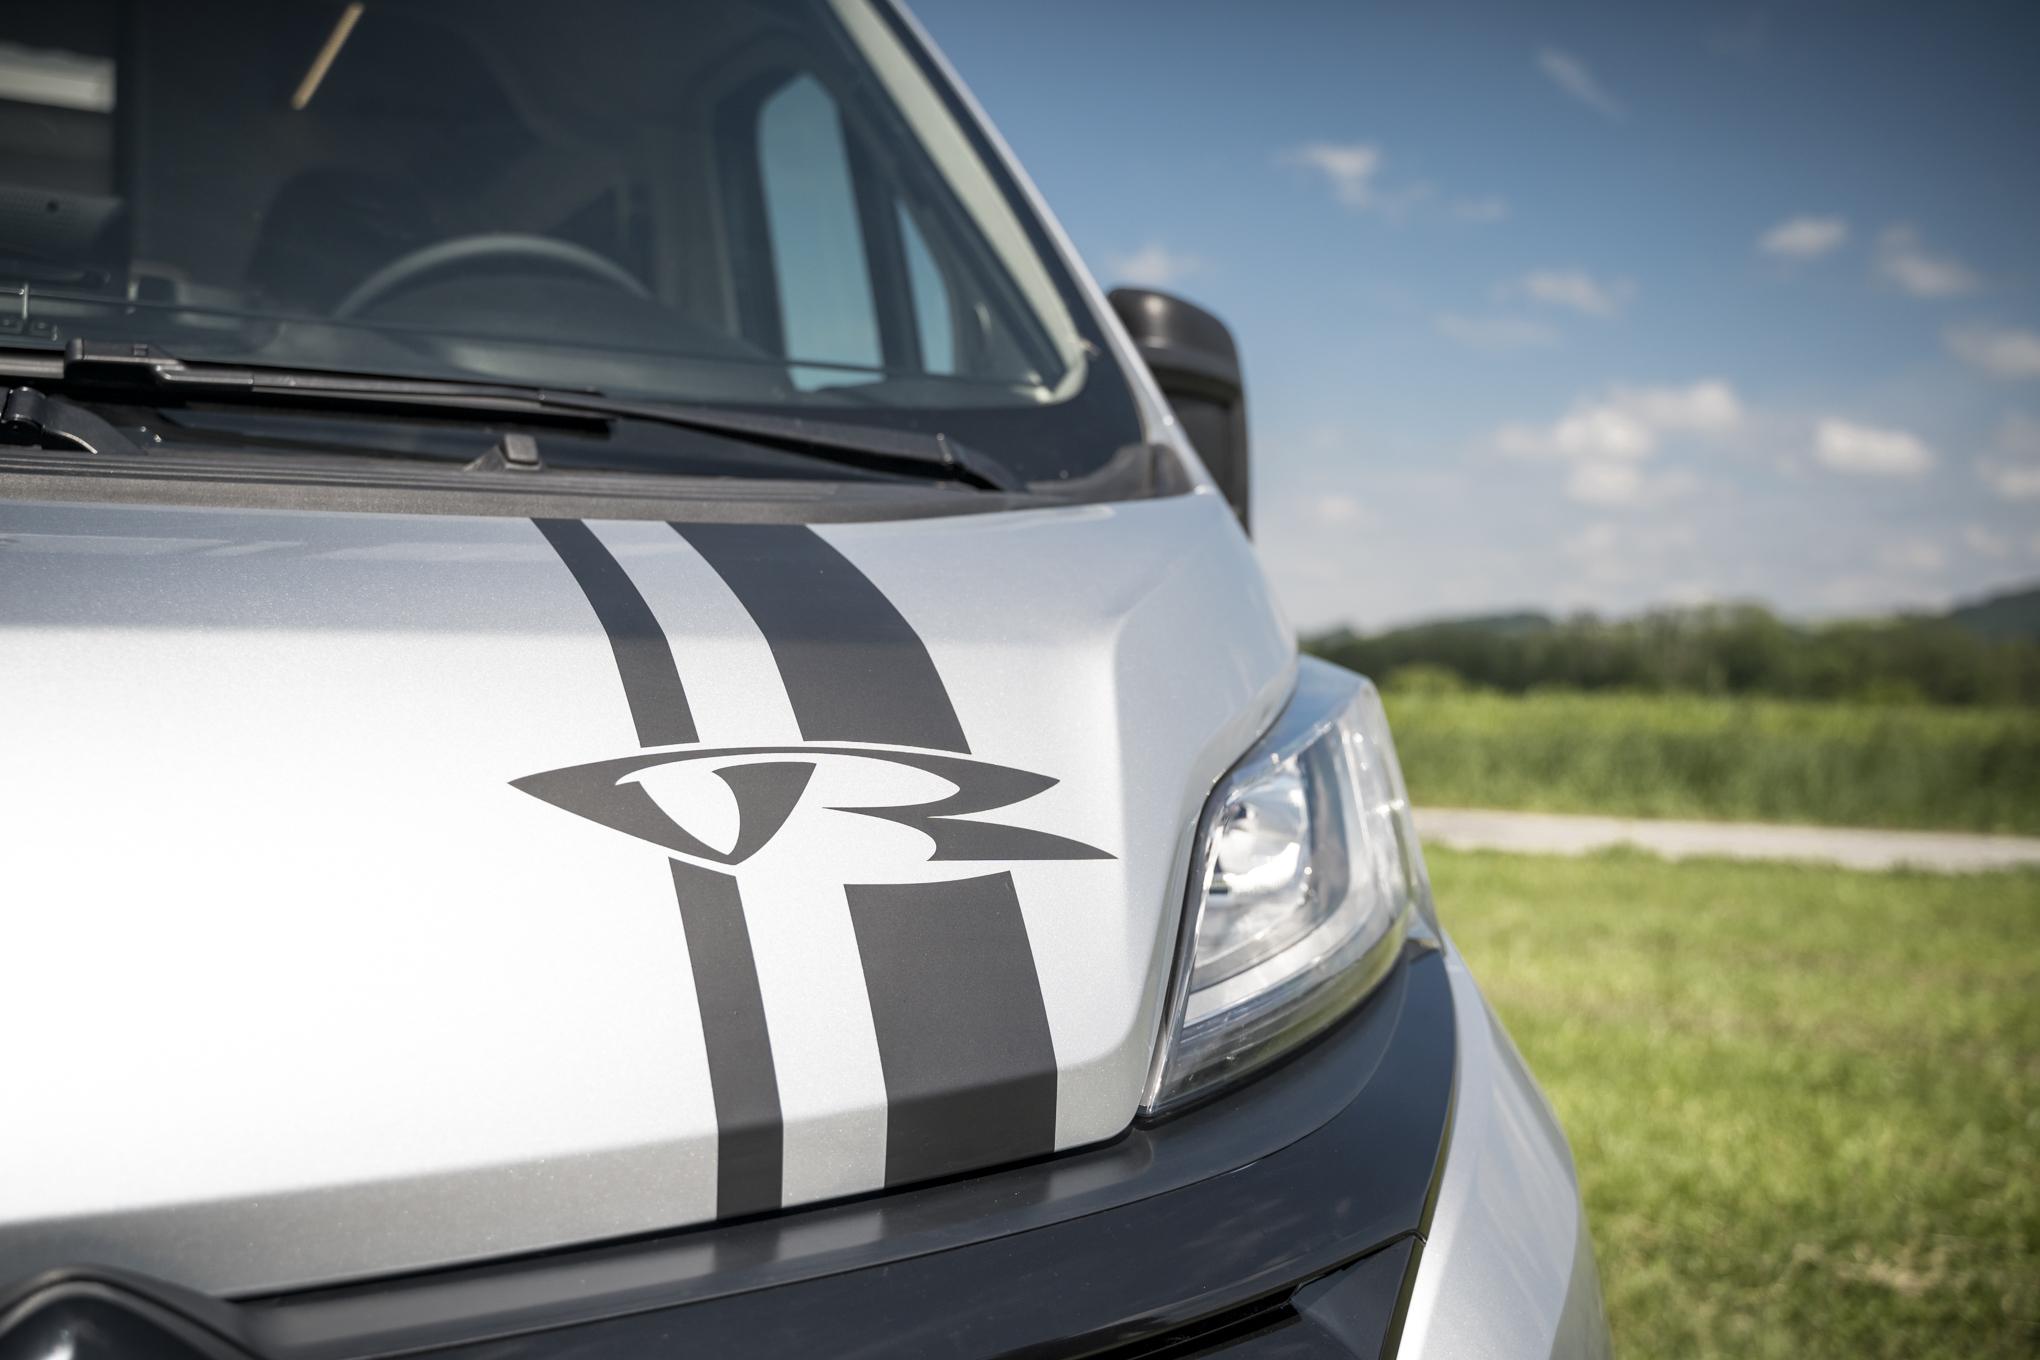 VR-Logo VR-motorhomes.de vrm mercedes sprinter citroen jumper